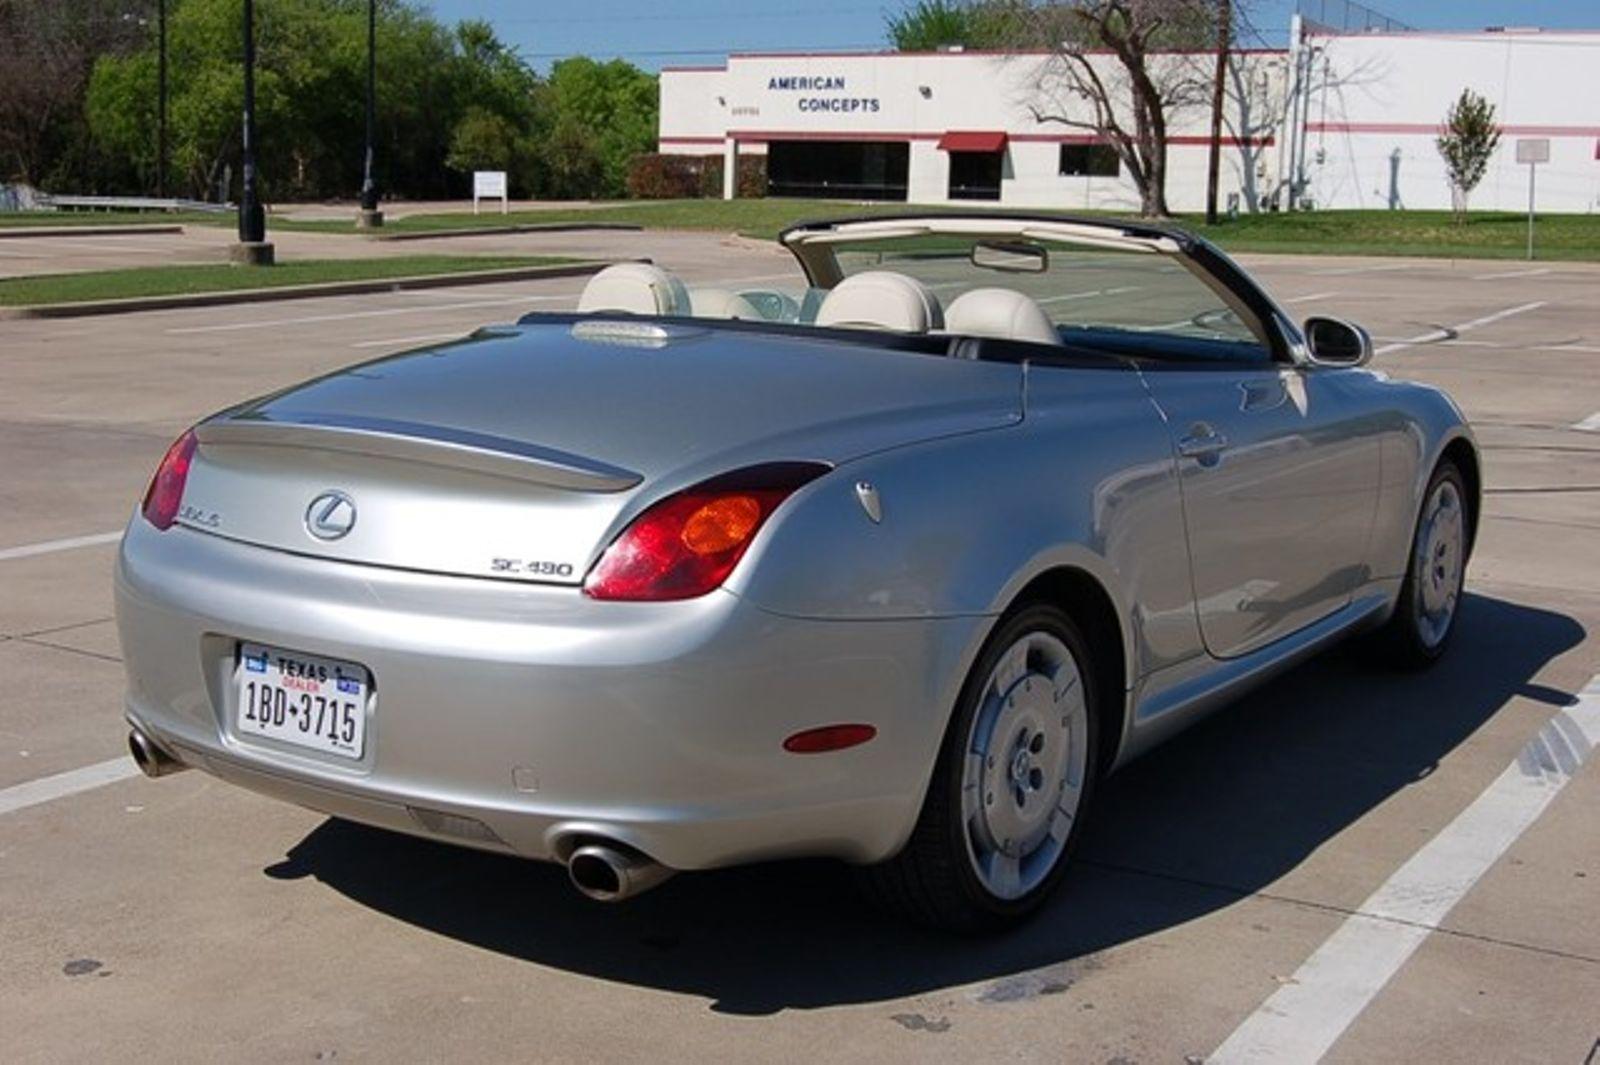 2005 lexus sc 430 low miles garland texas 75040. Black Bedroom Furniture Sets. Home Design Ideas